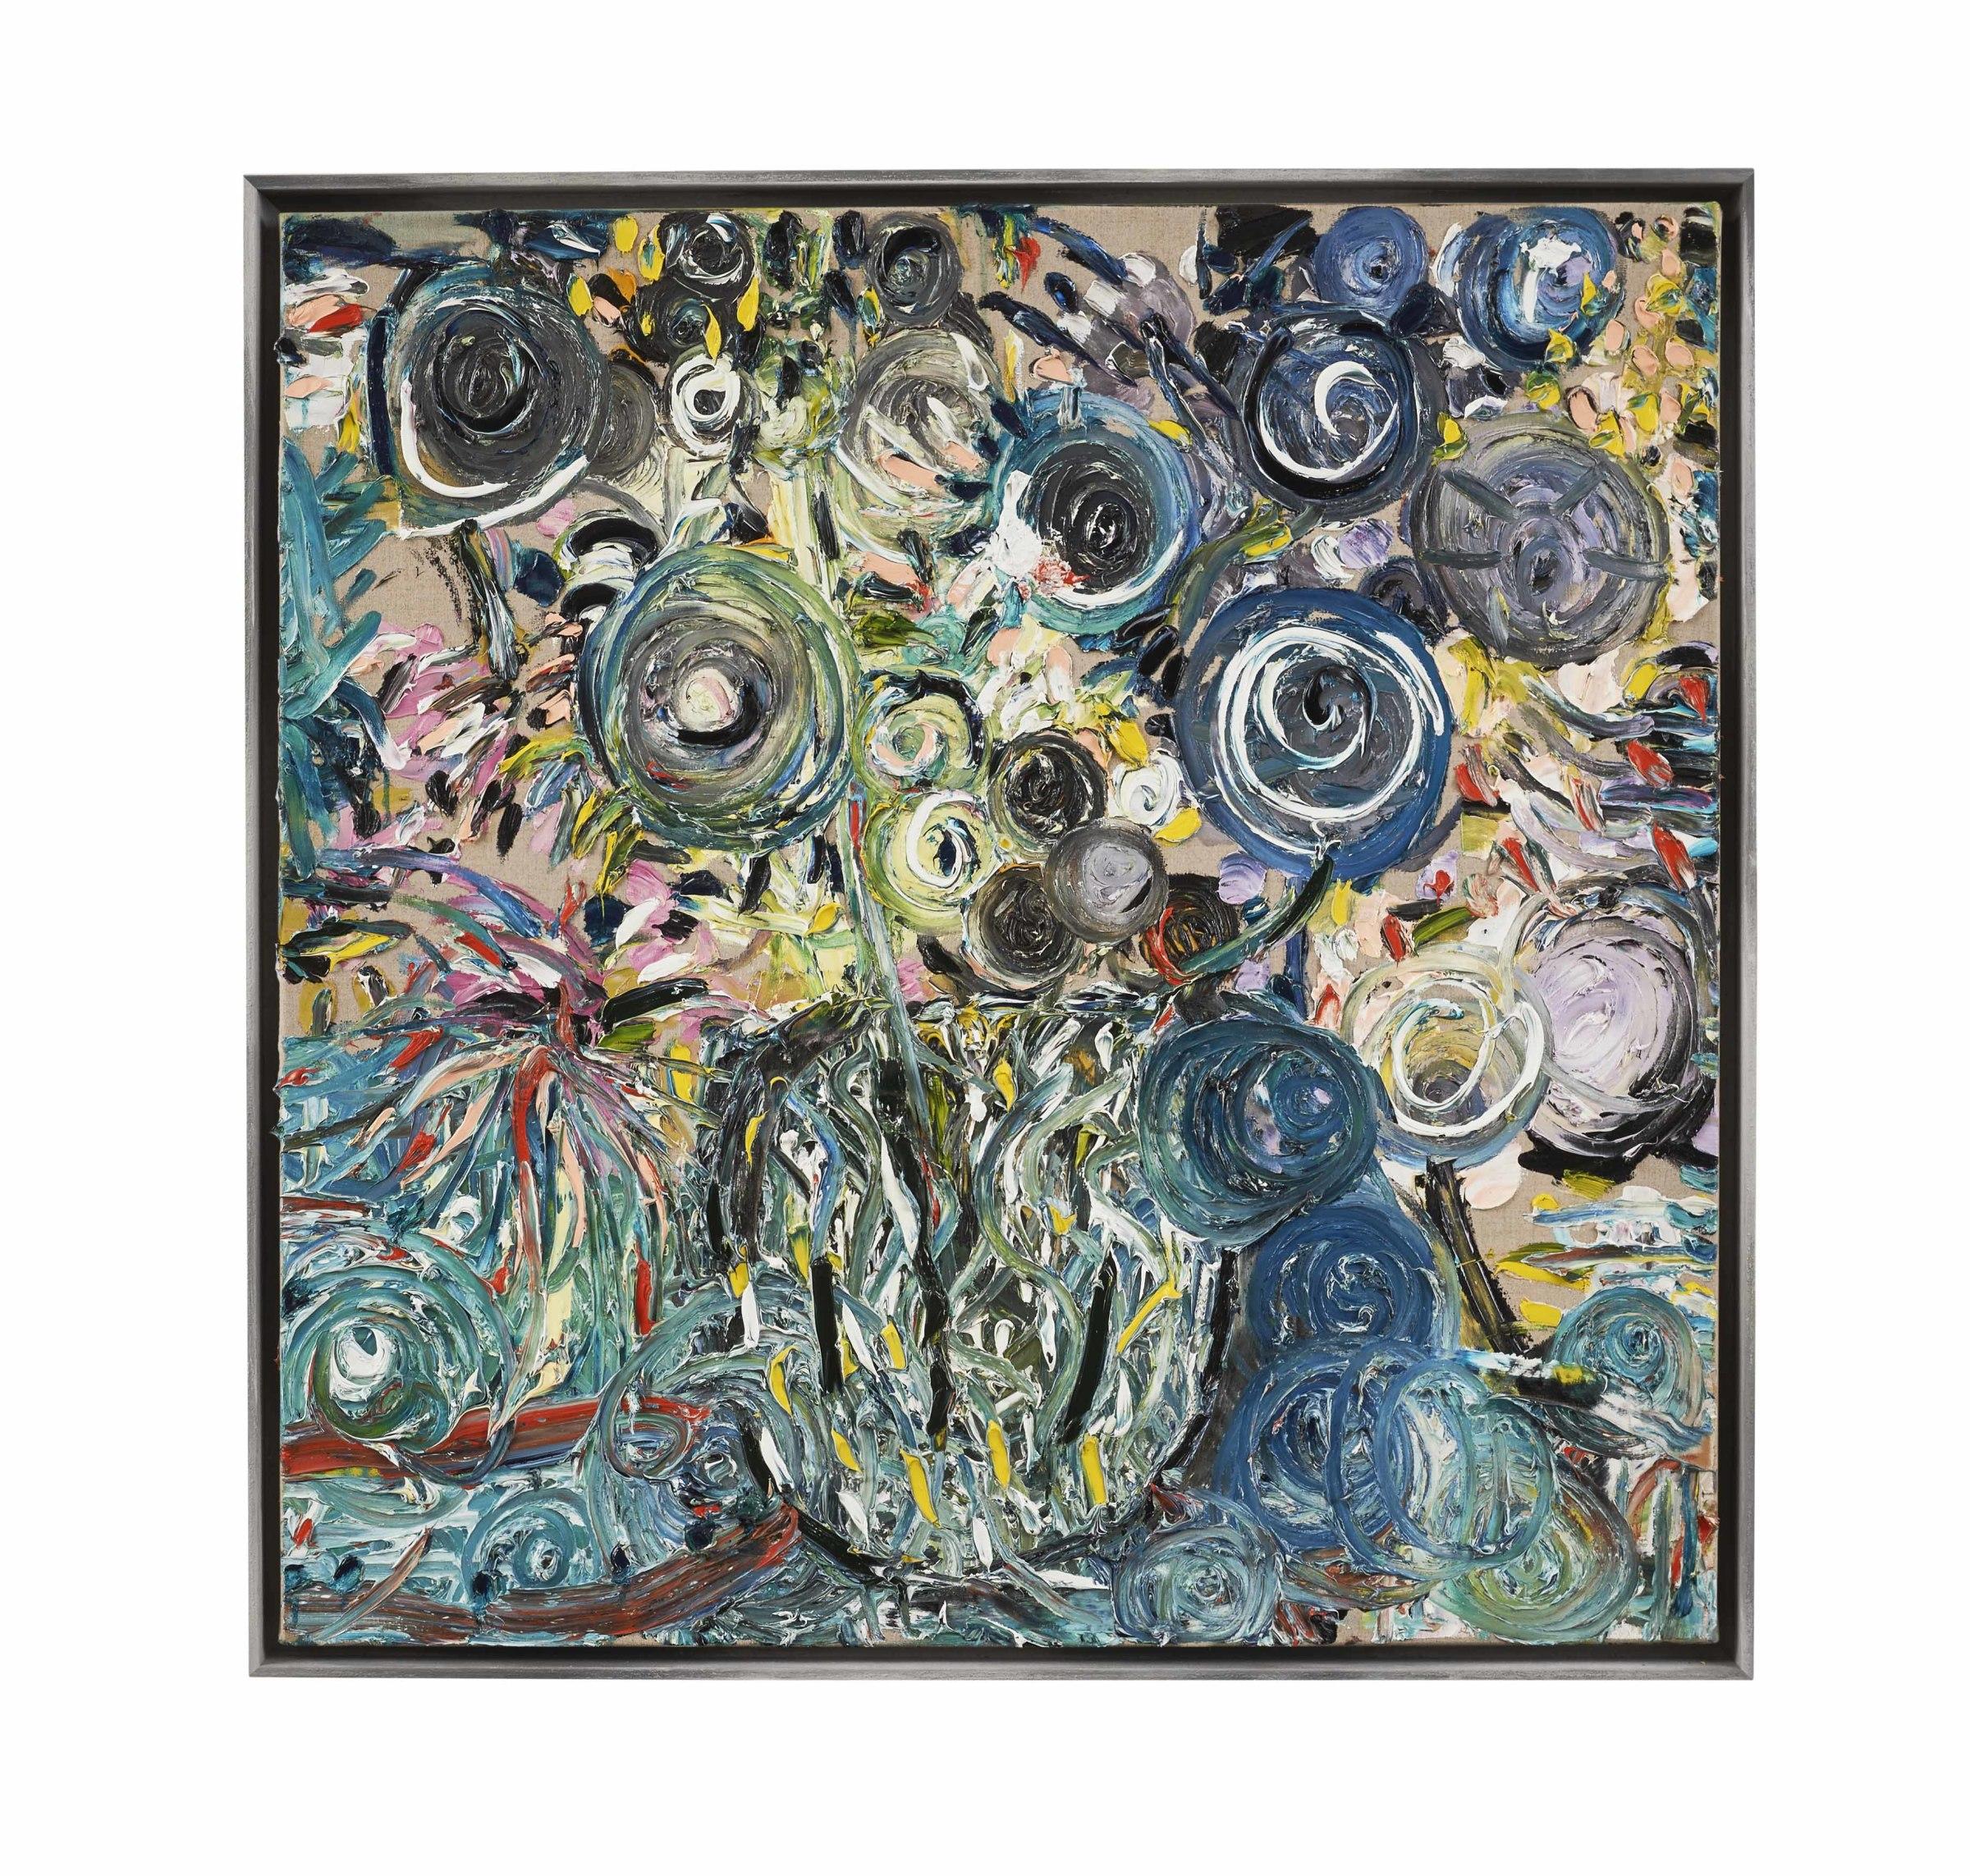 <span class=&#34;link fancybox-details-link&#34;><a href=&#34;/exhibitions/16/works/artworks3932/&#34;>View Detail Page</a></span><div class=&#34;artist&#34;><strong>Maarten Vrolijk</strong></div><div class=&#34;title&#34;><em>Flowers in blue</em>, 2017</div><div class=&#34;dimensions&#34;>100 x 100 cm</div>